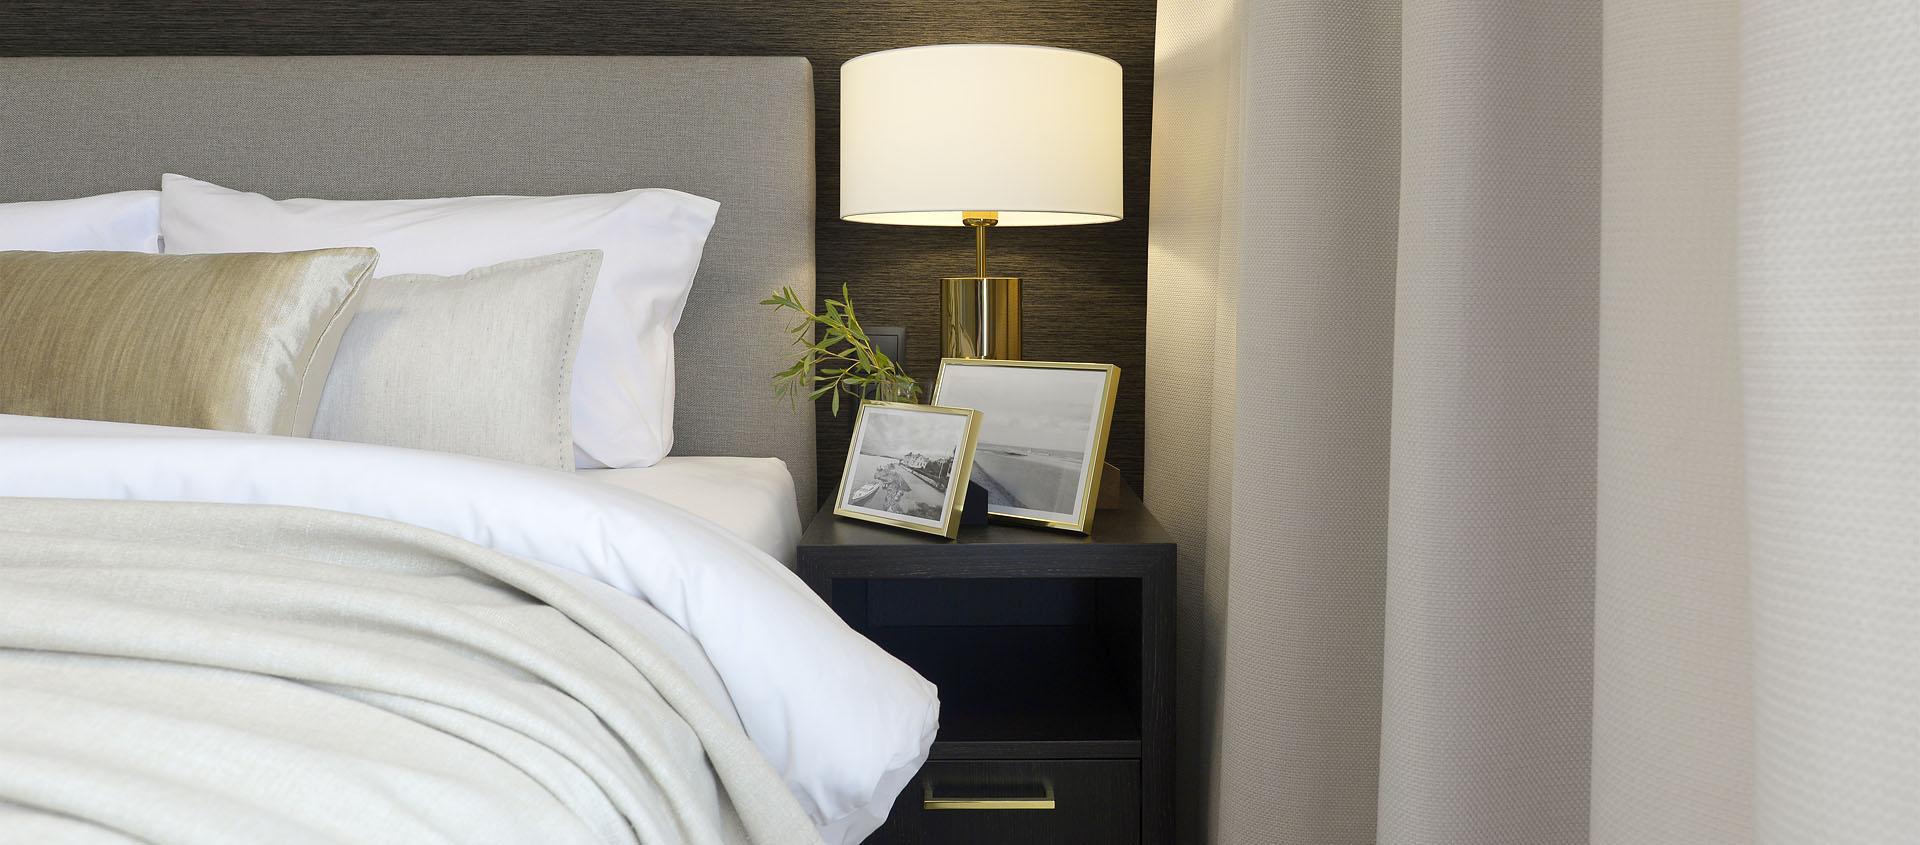 Elegancka sypialnia, tekstylna tapeta, złote lampy